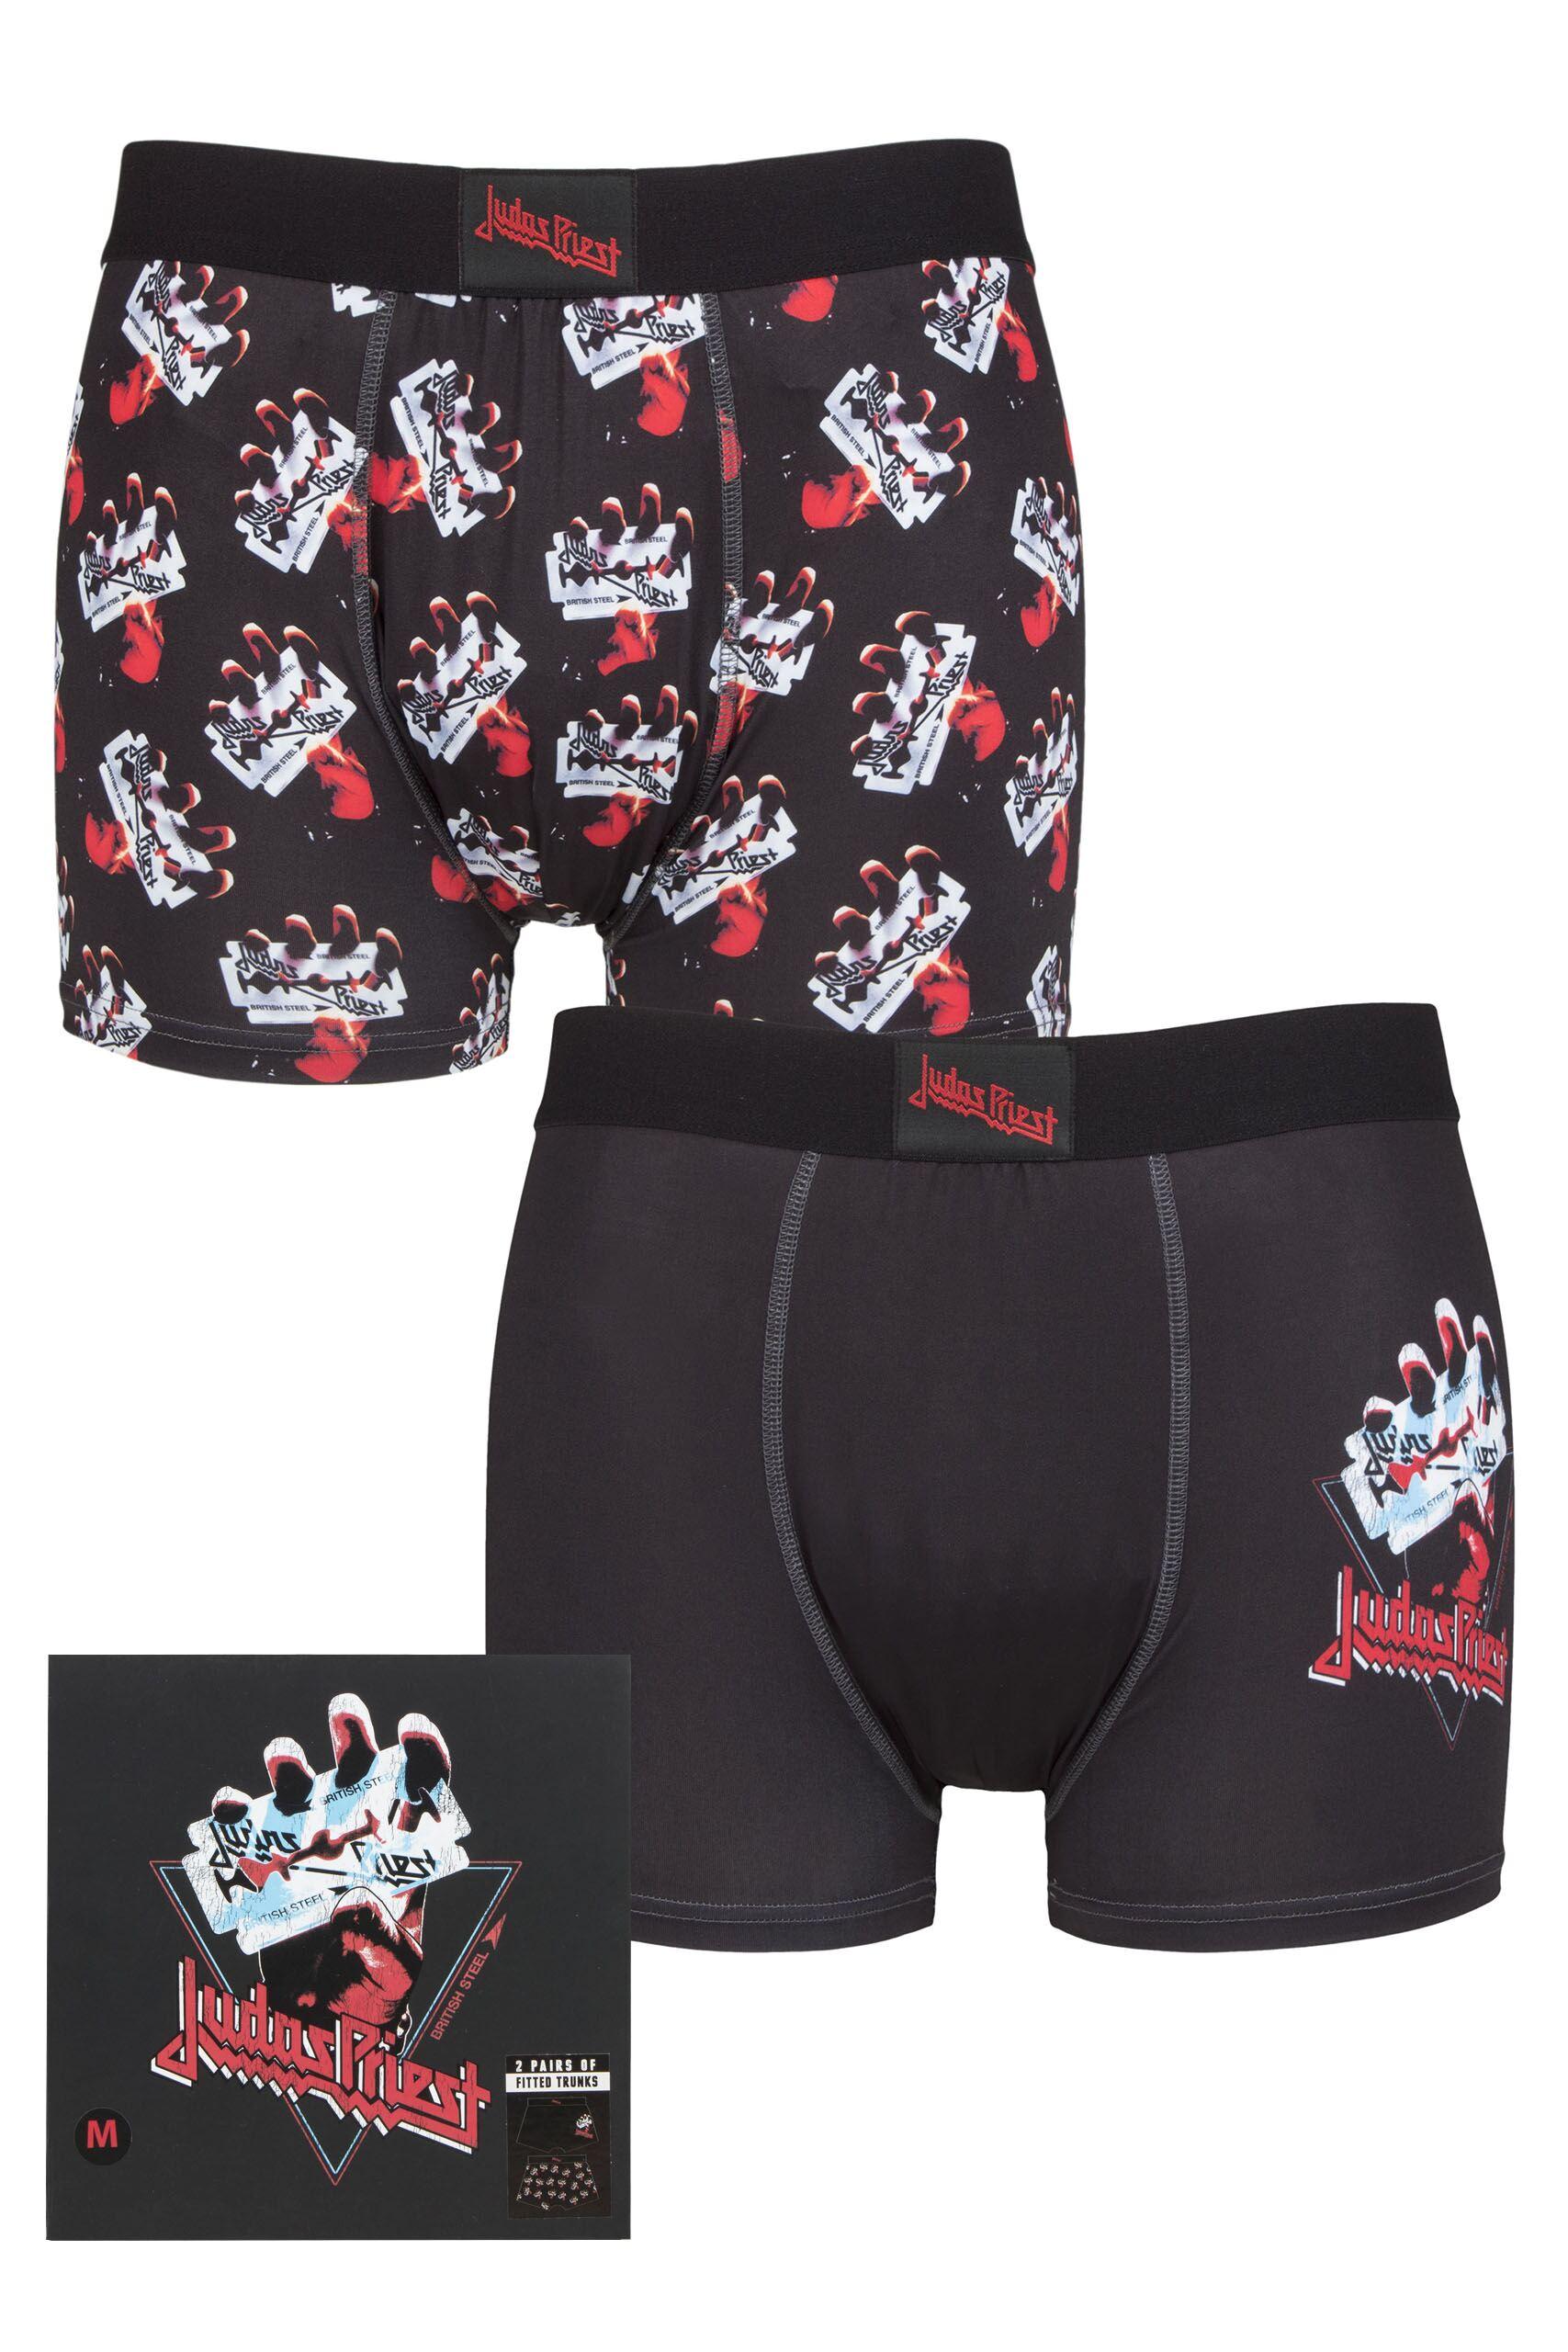 Men's Underwear Judas Priest 2 Pack Exclusive to SOCKSHOP Gift Boxed Boxer Shorts Black Medium